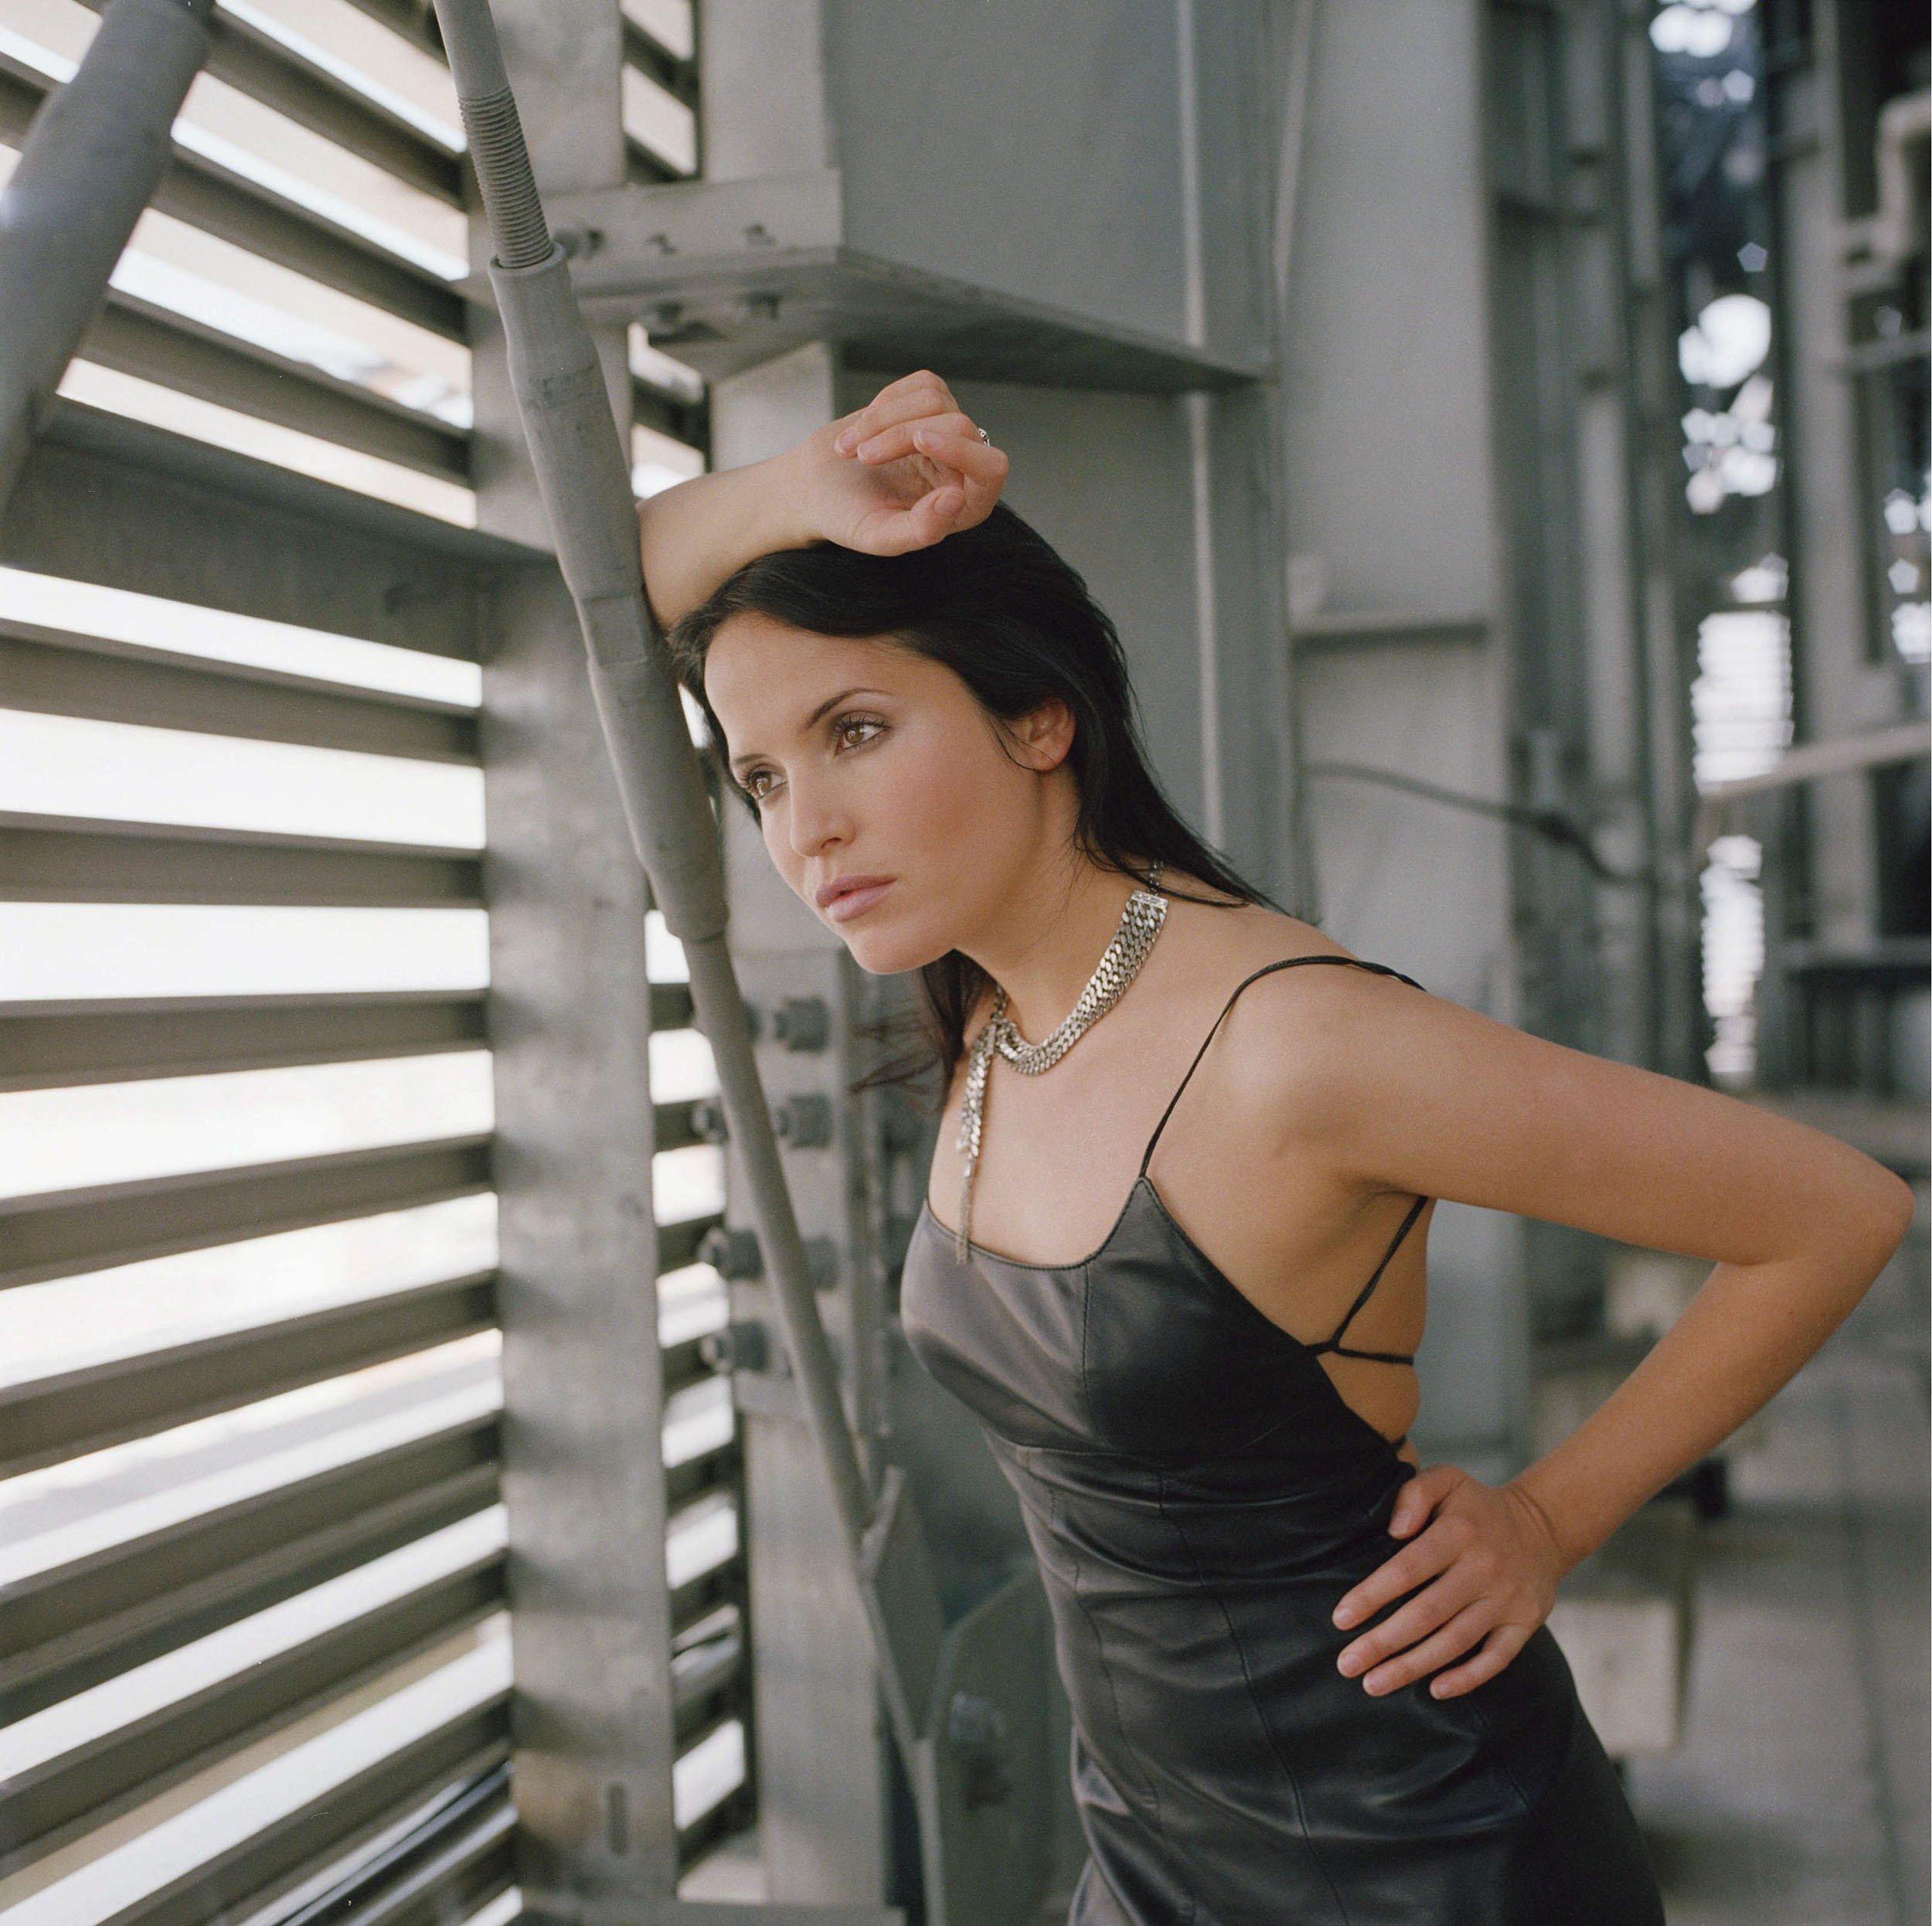 Andrea corr lyrics music news and biography metrolyrics hhandrea corr artist photos altavistaventures Images